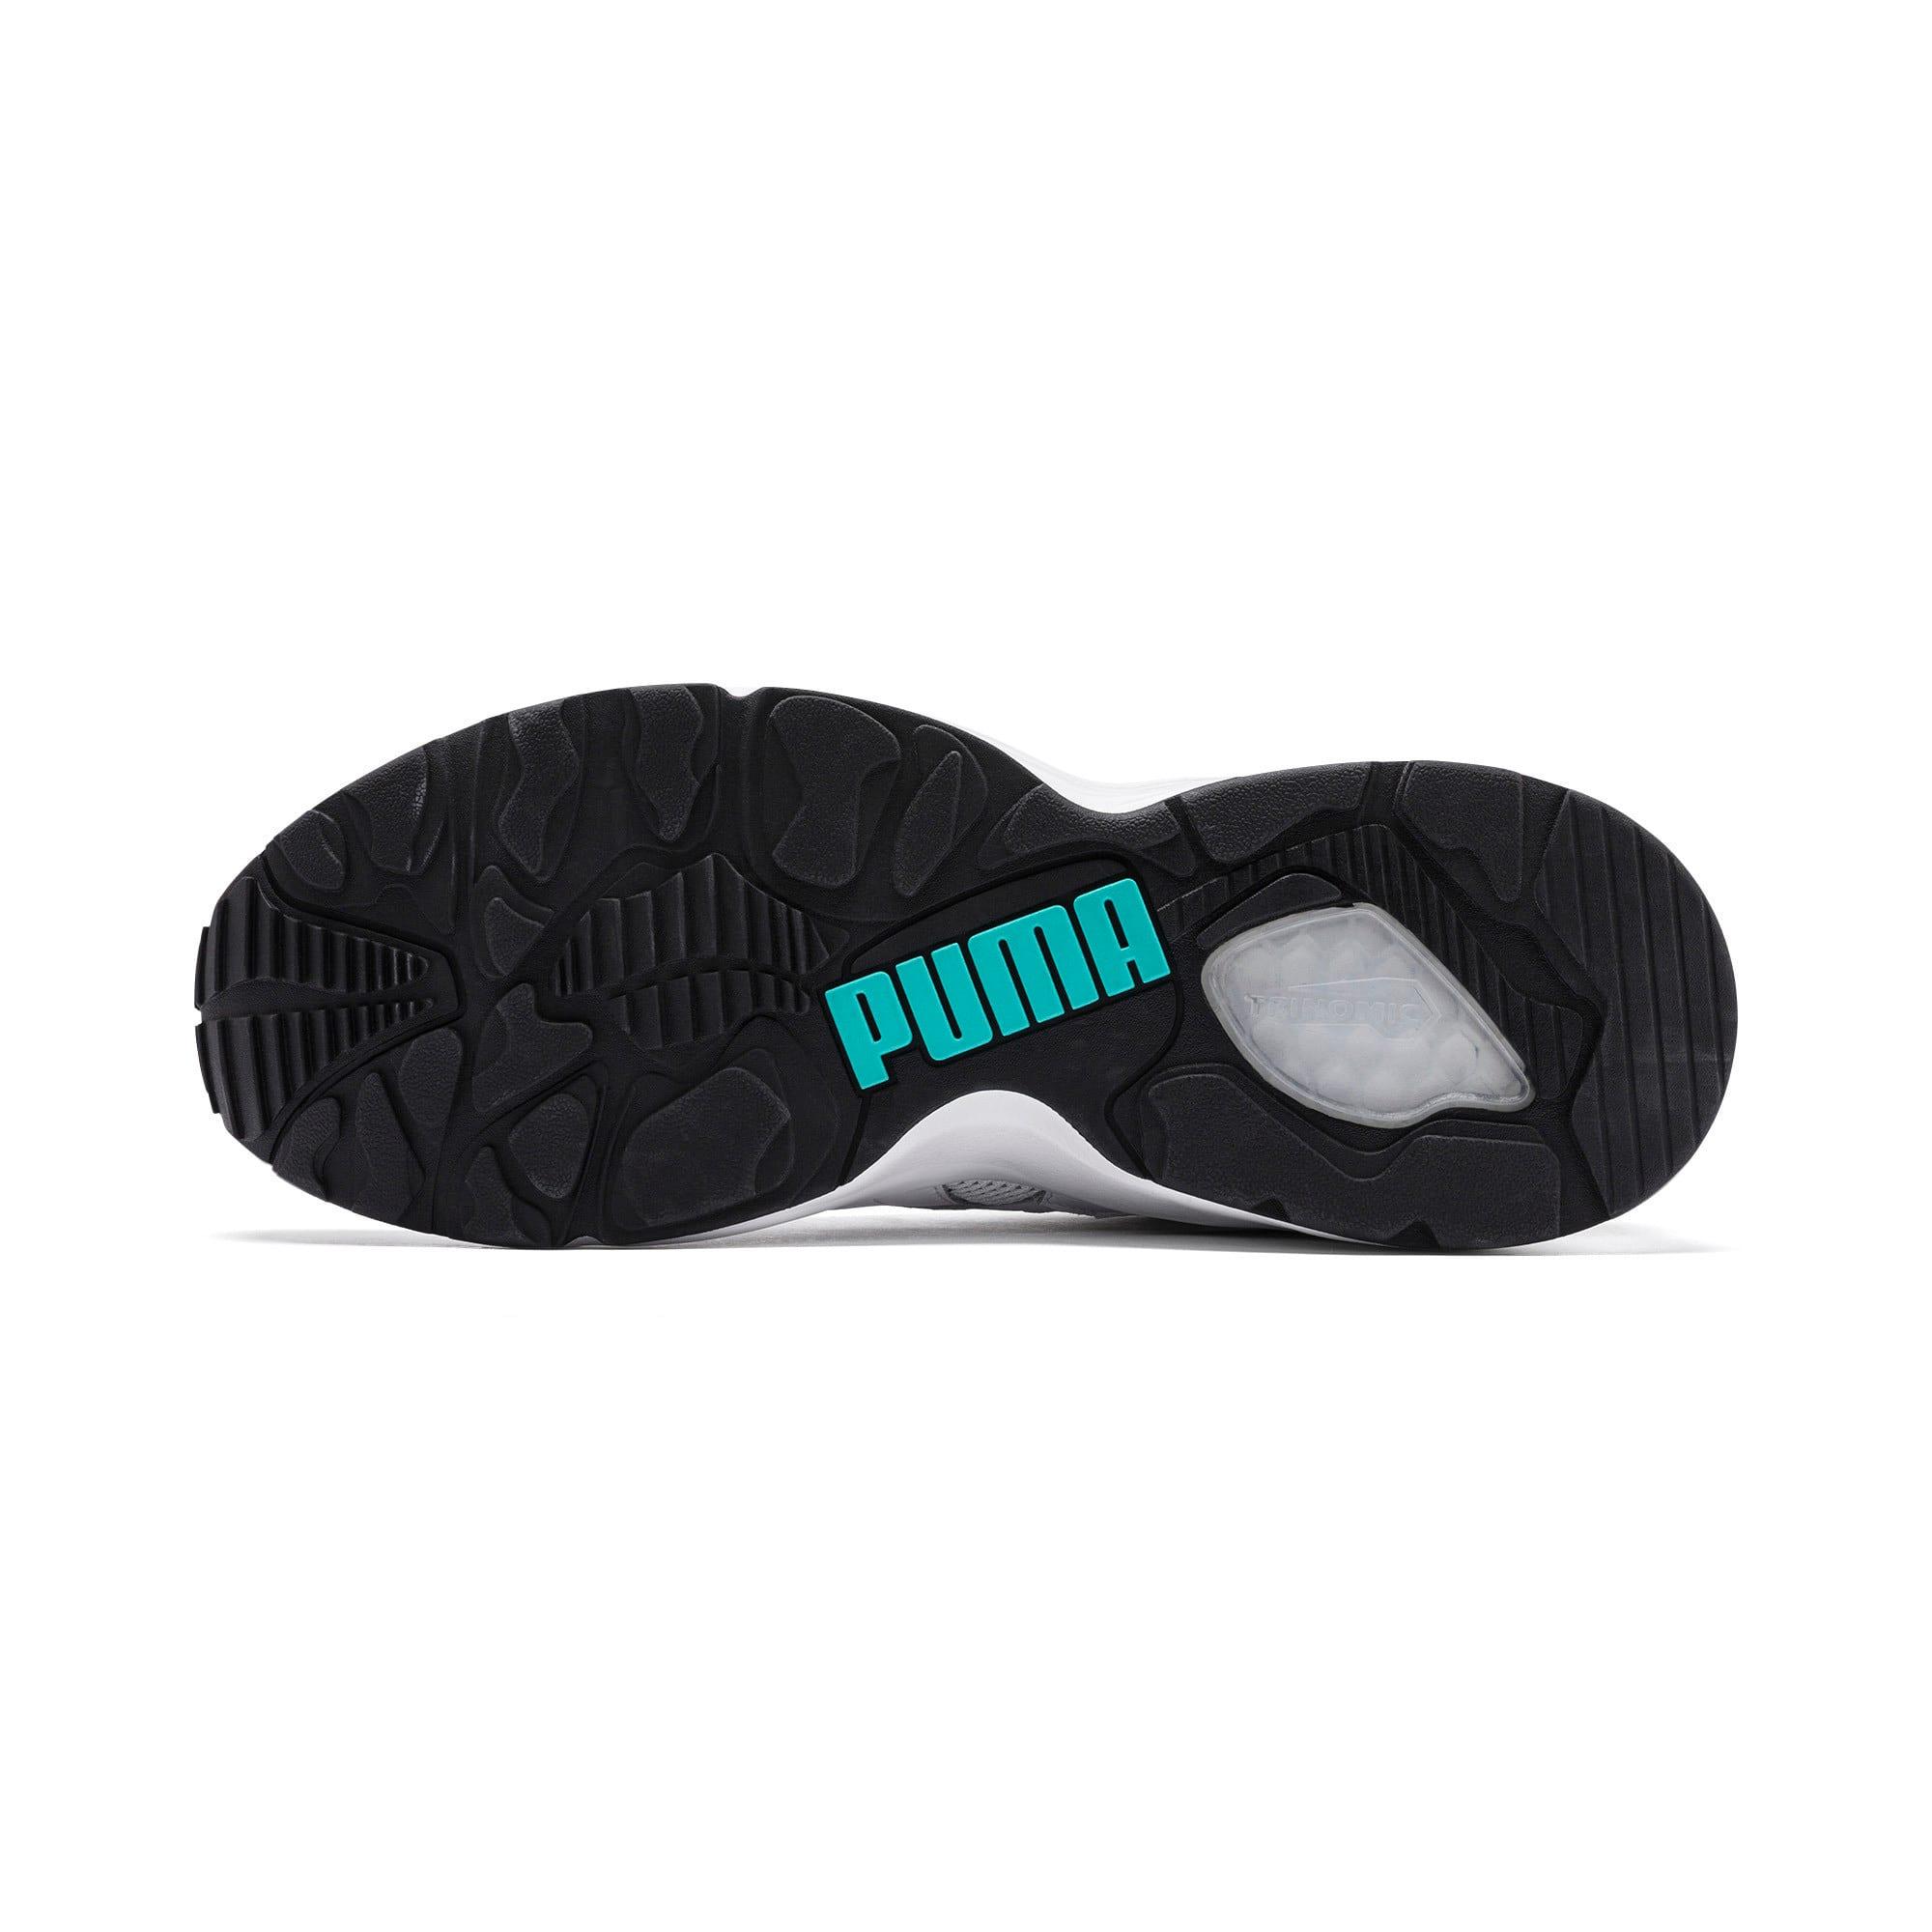 Thumbnail 4 of Prevail Classic Sneakers, Puma White-Blue Turquoise, medium